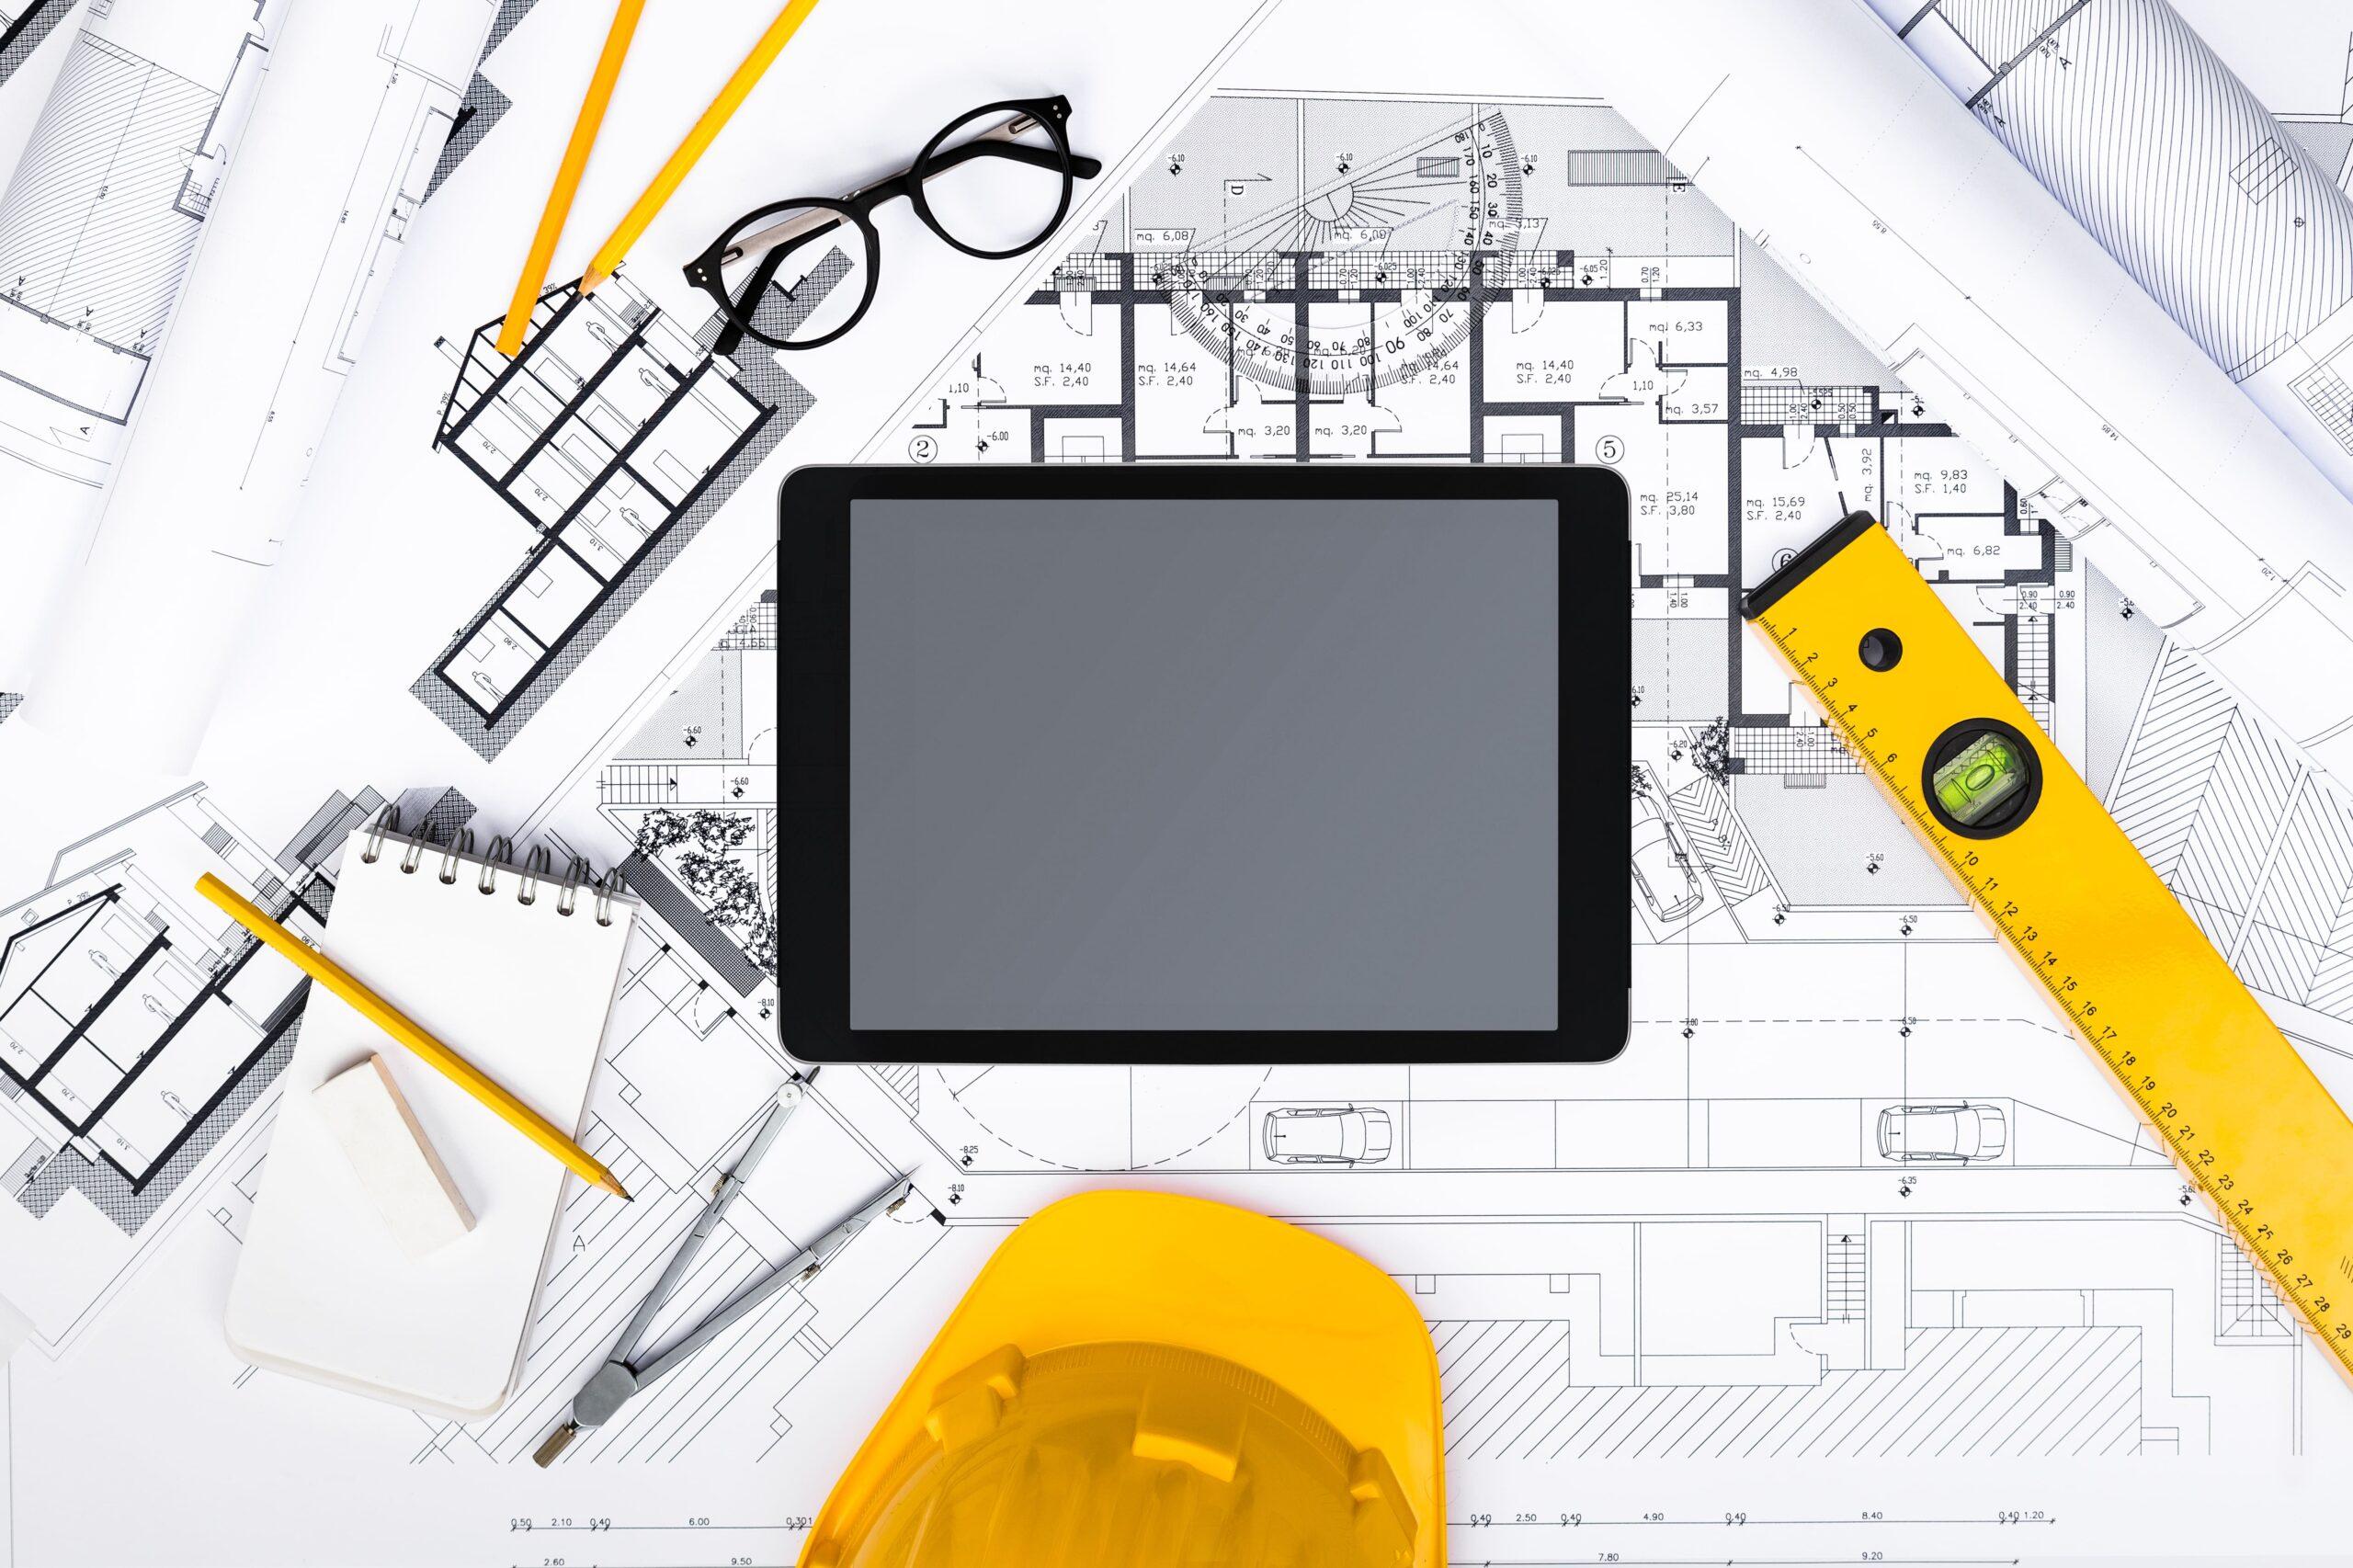 iStock-637563538 tablet